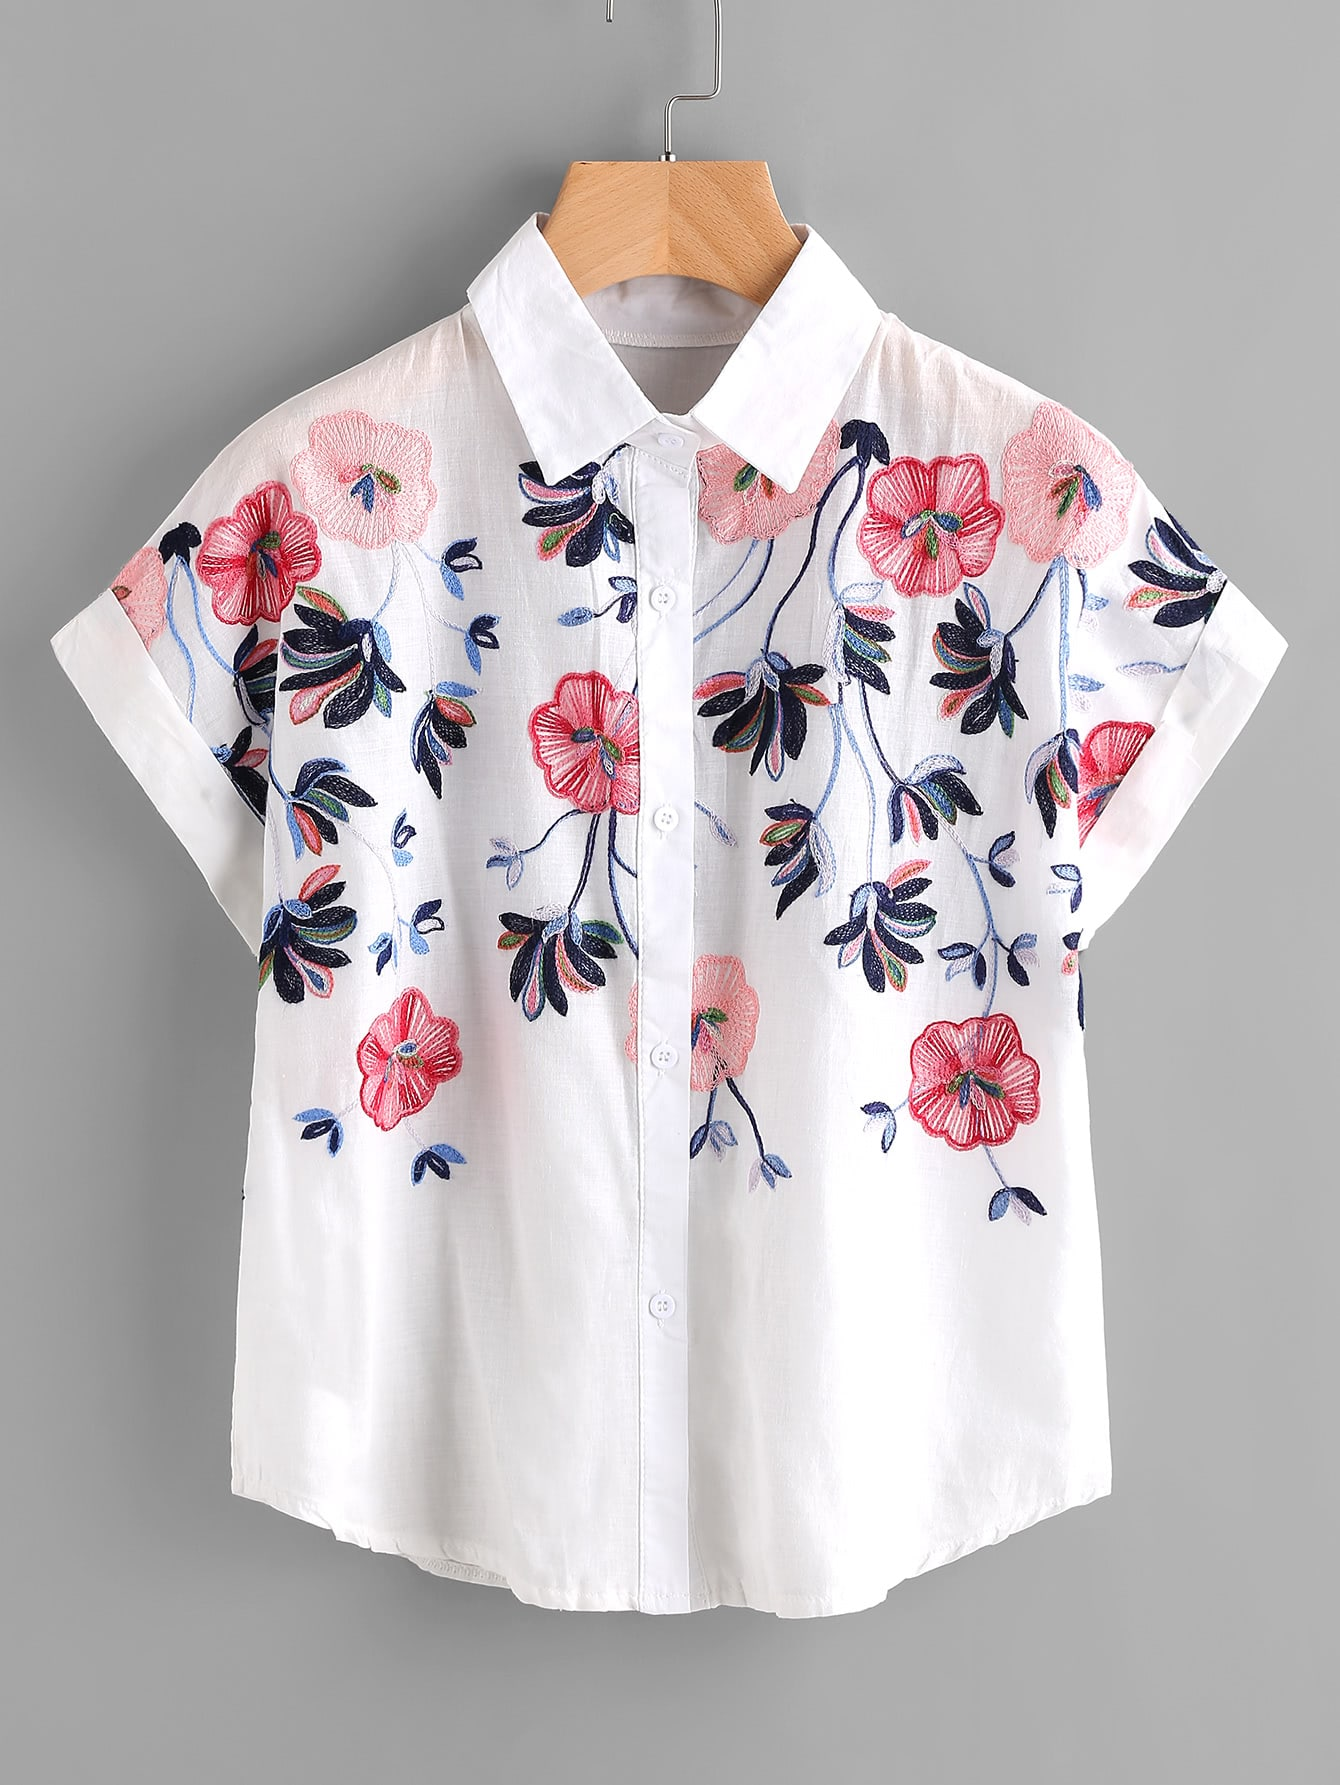 Embroidery rolled sleeve shirt shein sheinside